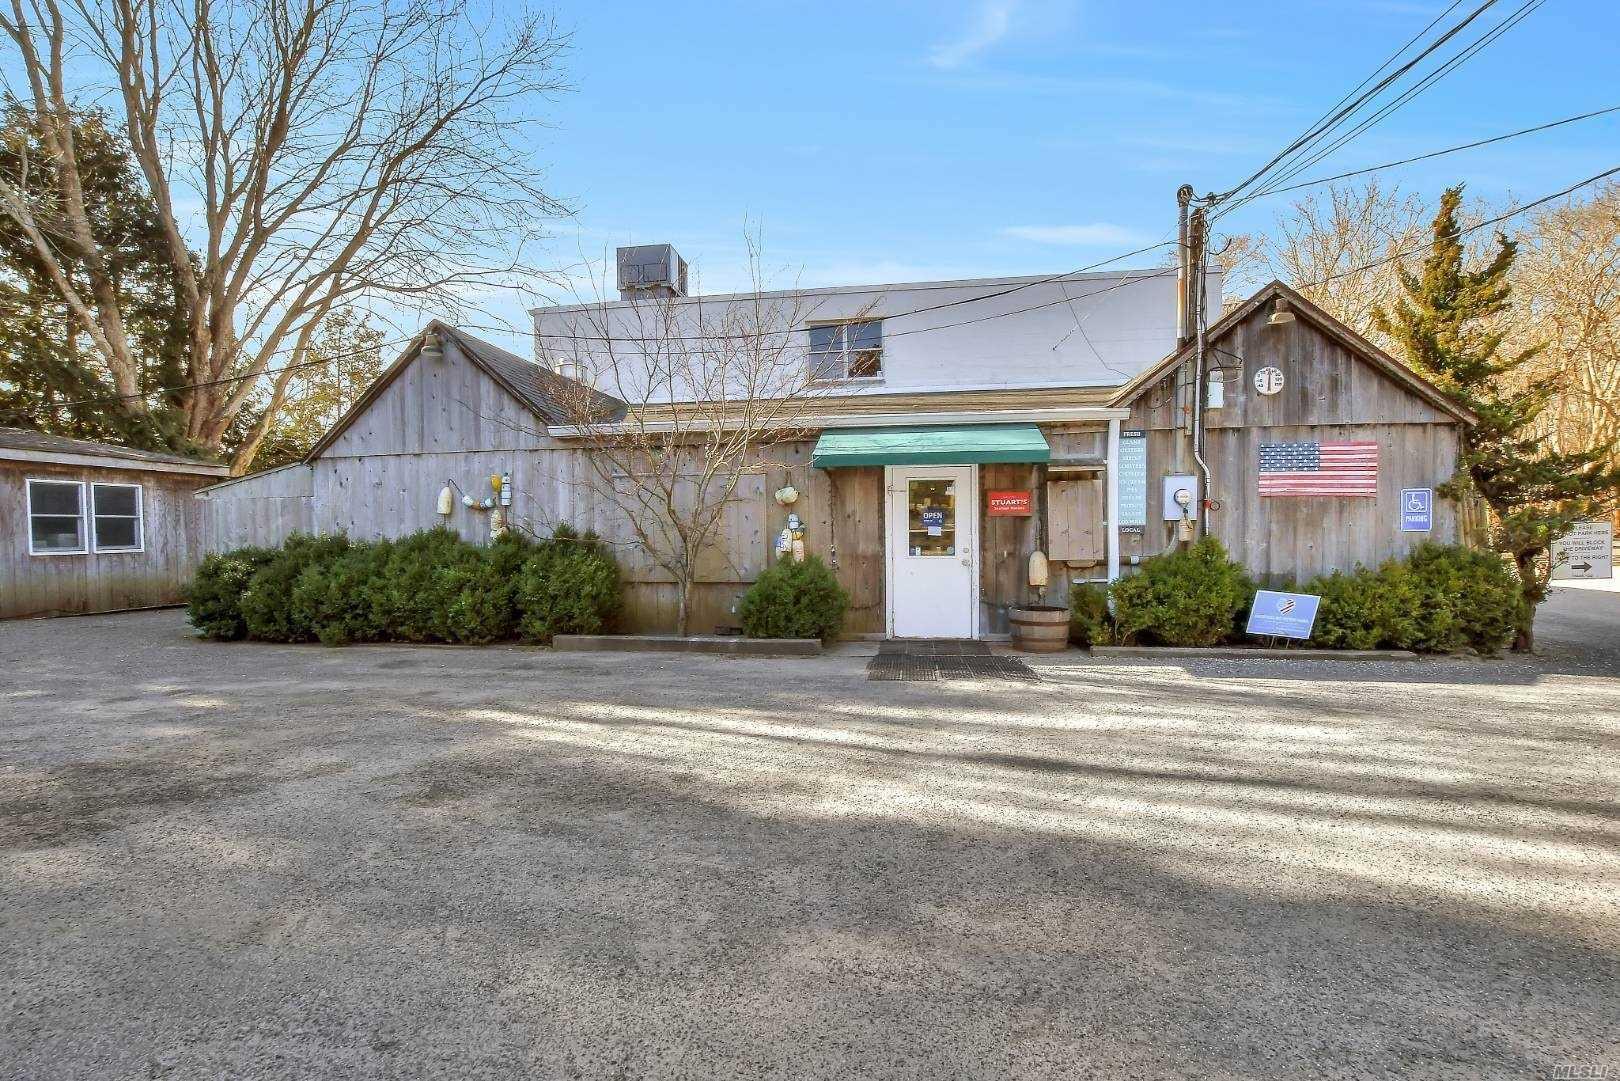 41 Oak Ln - Amagansett, New York